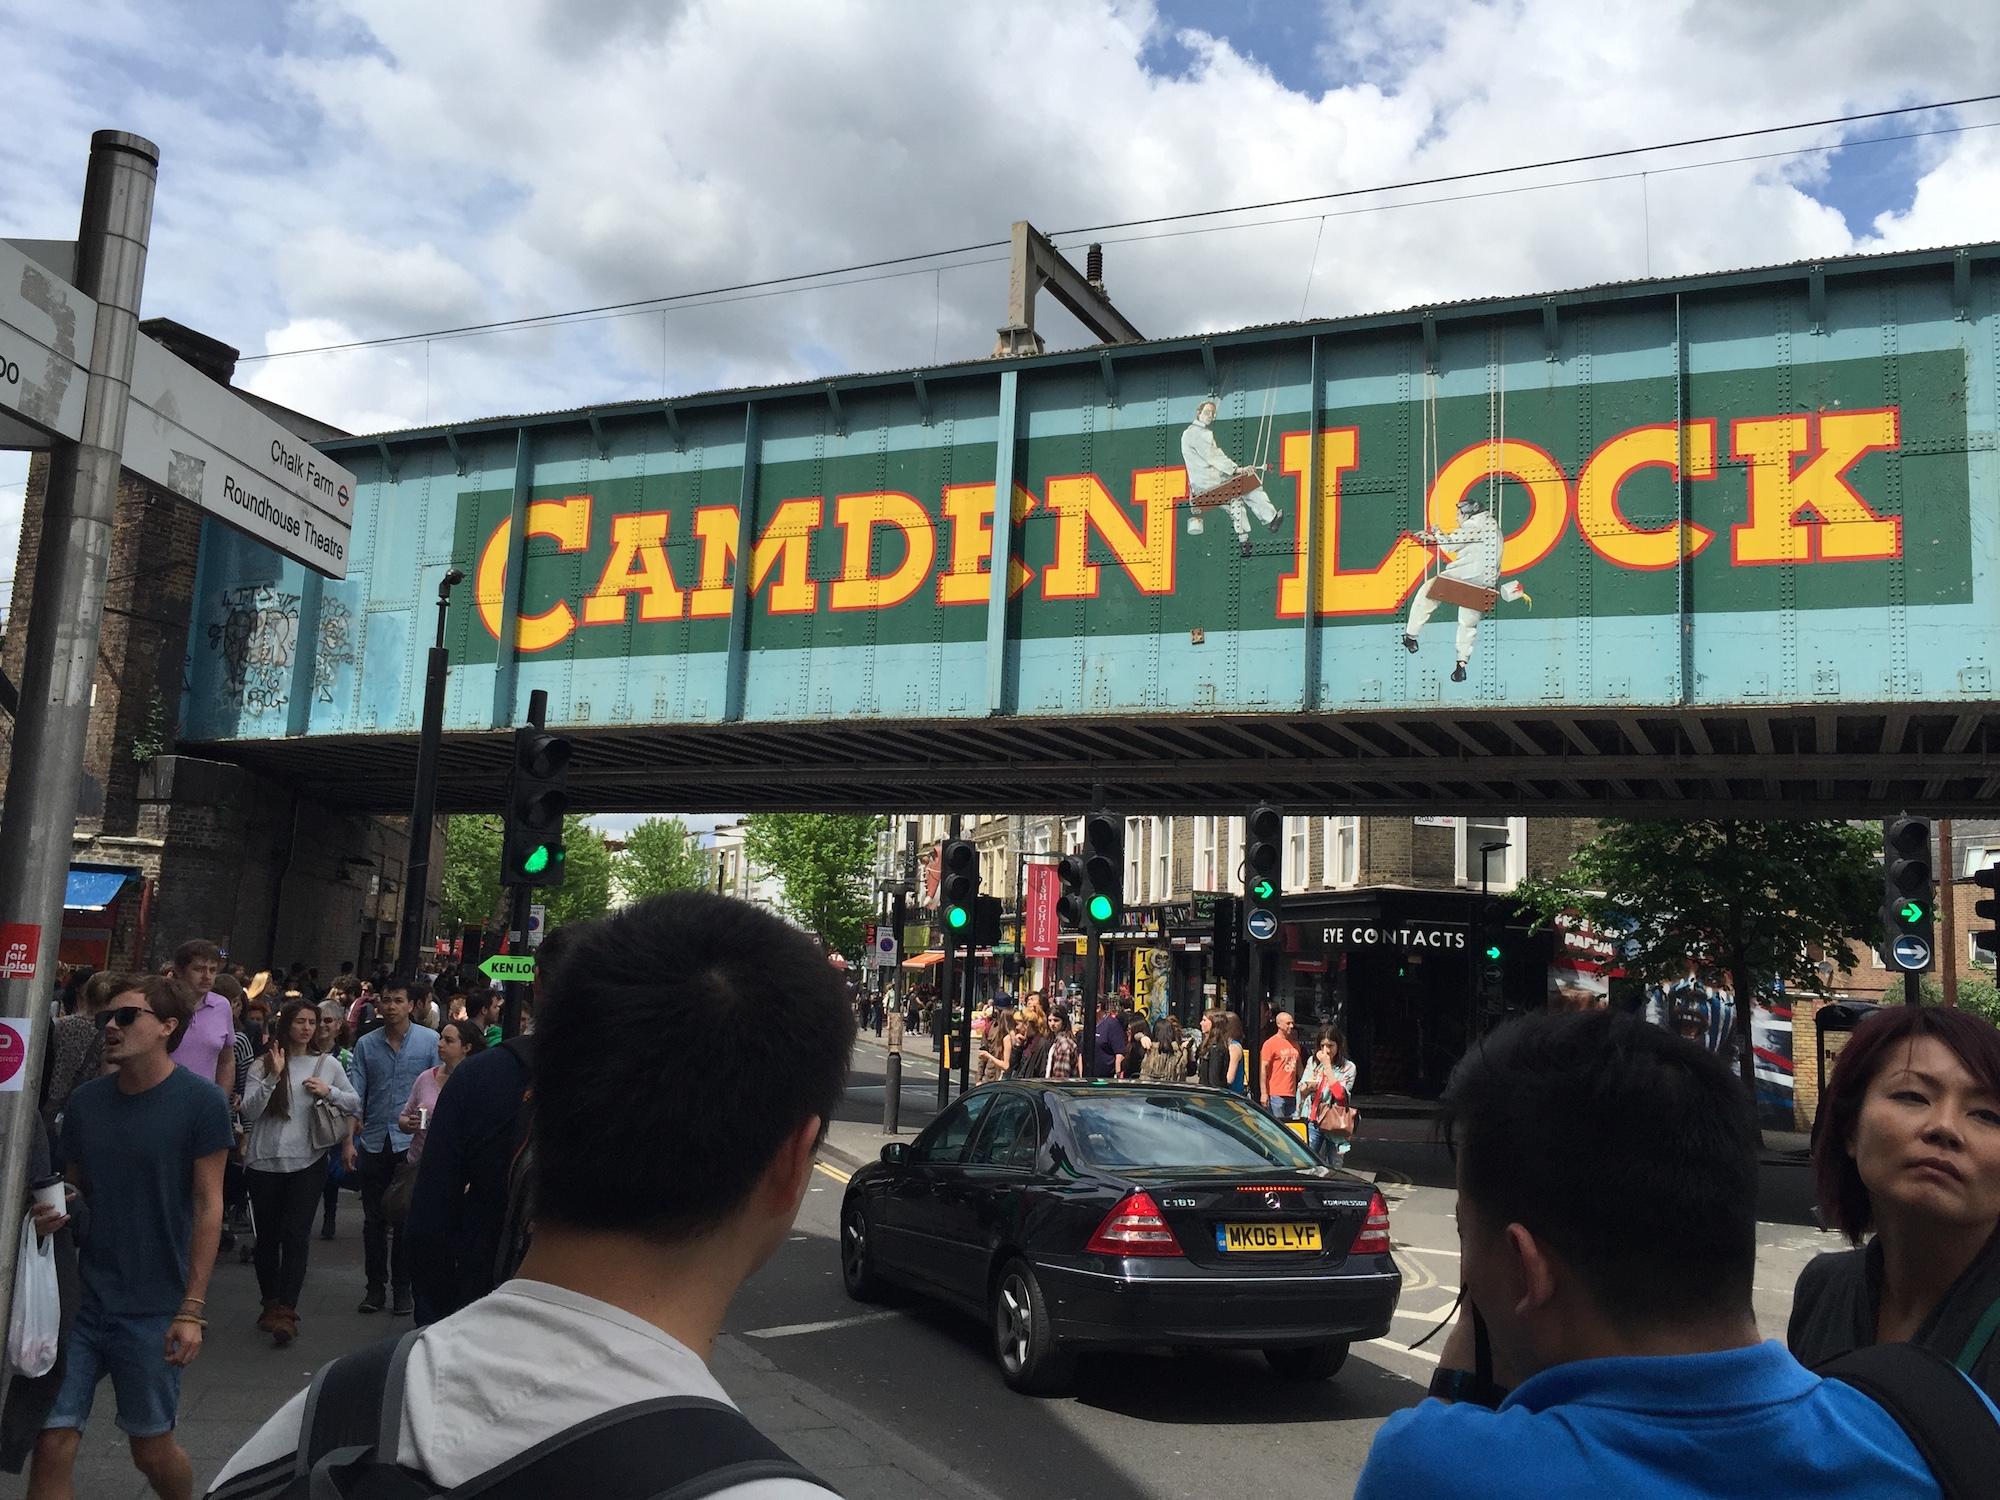 Camden Lock Bridge Hero. A Broad In London